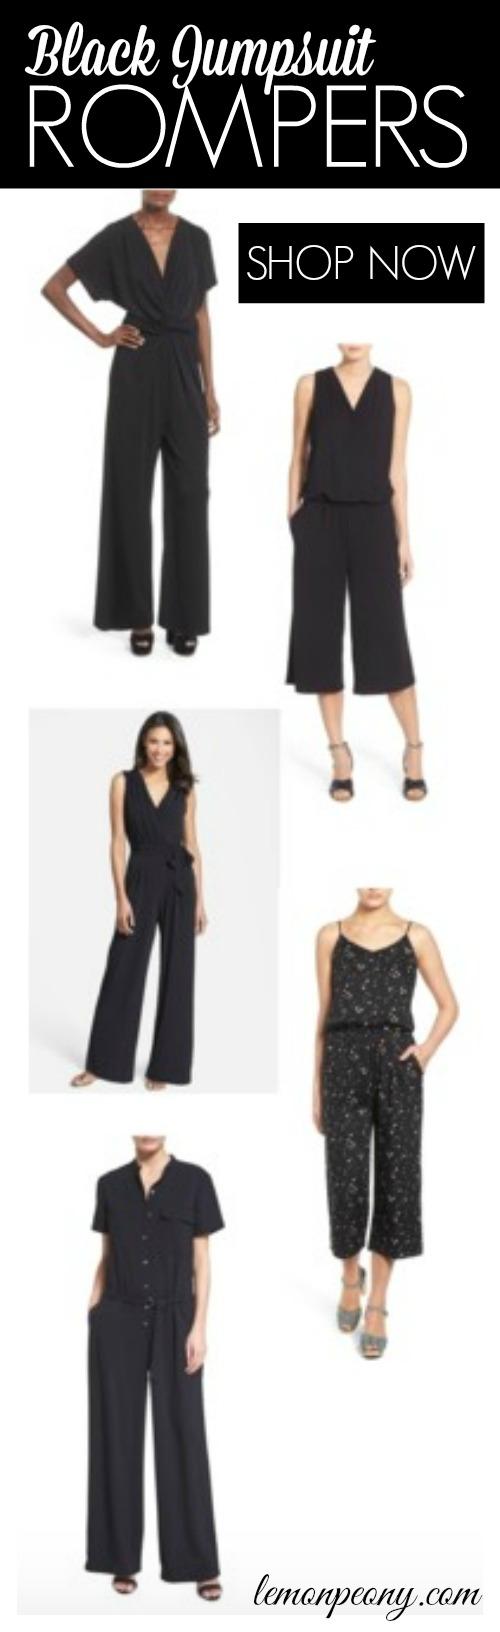 Black Jumpsuit Rompers Fashion